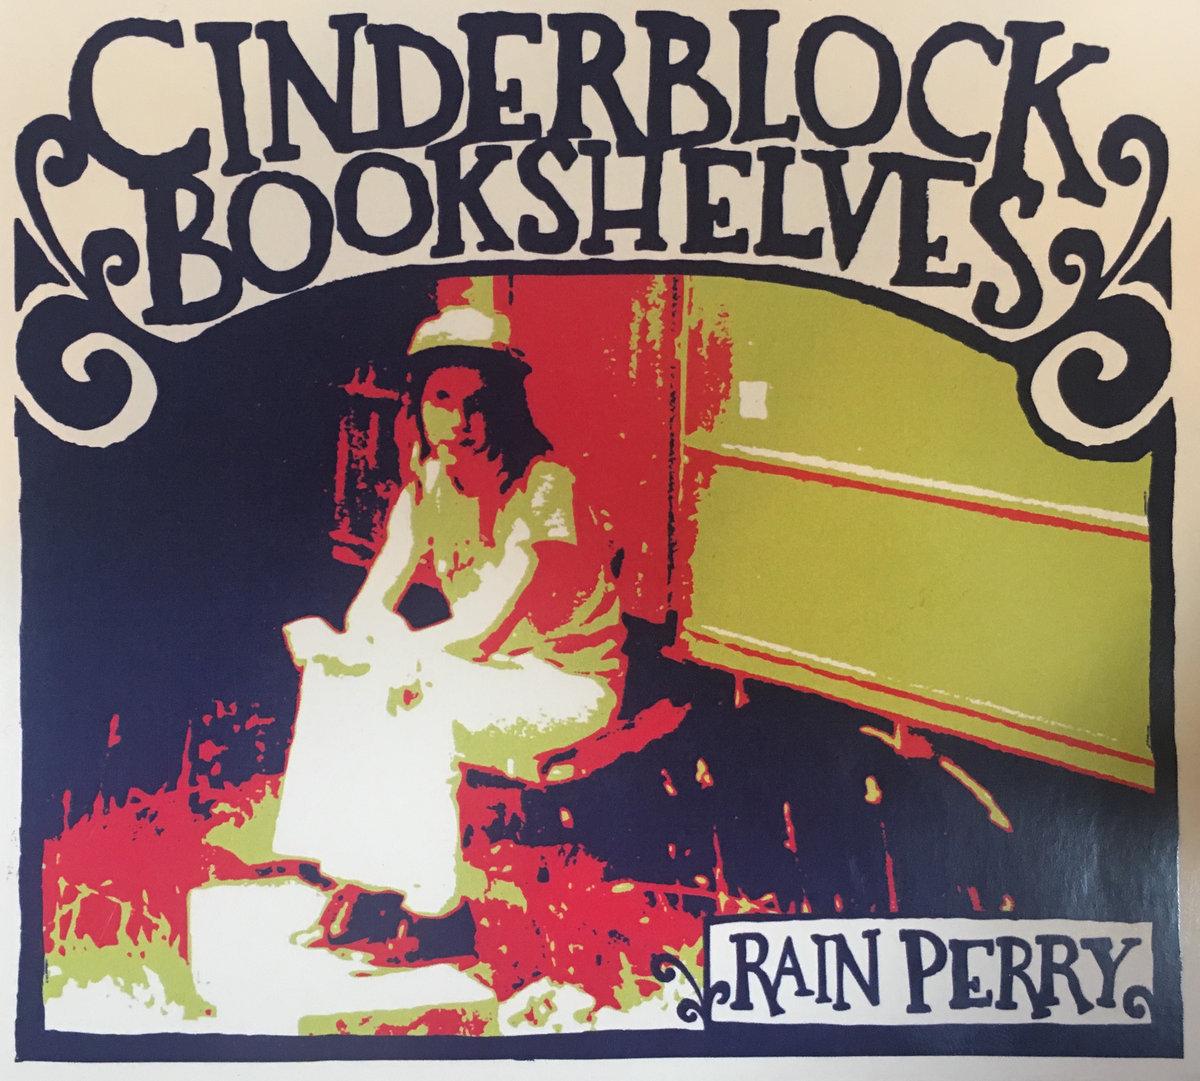 Cinderblock Bookshelves | Rain Perry